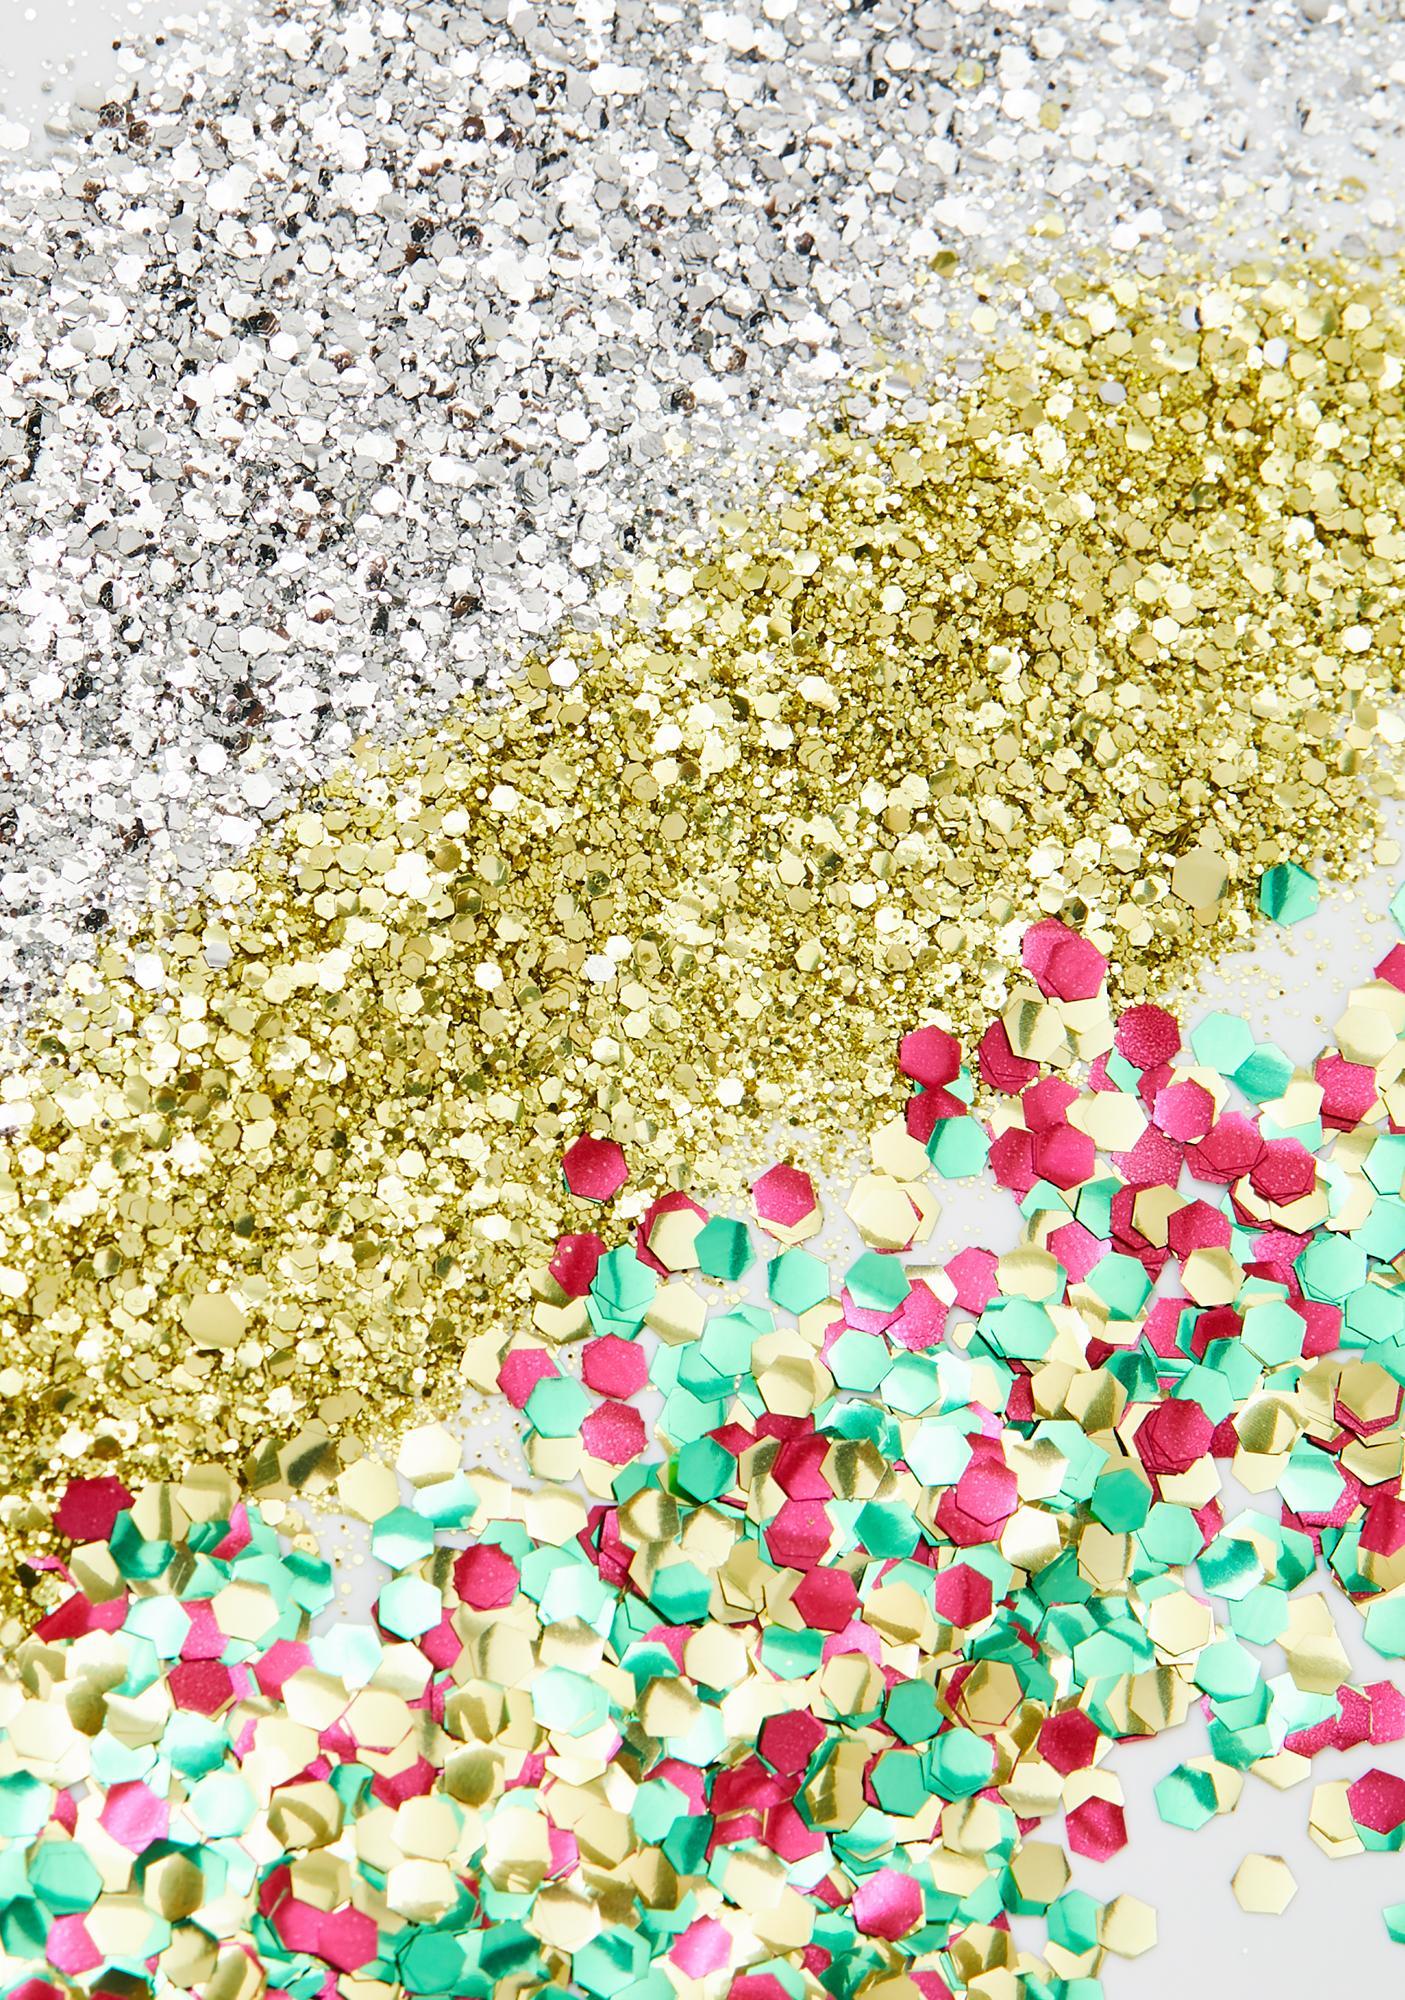 EcoStardust Festive Biodegradable Glitter Set